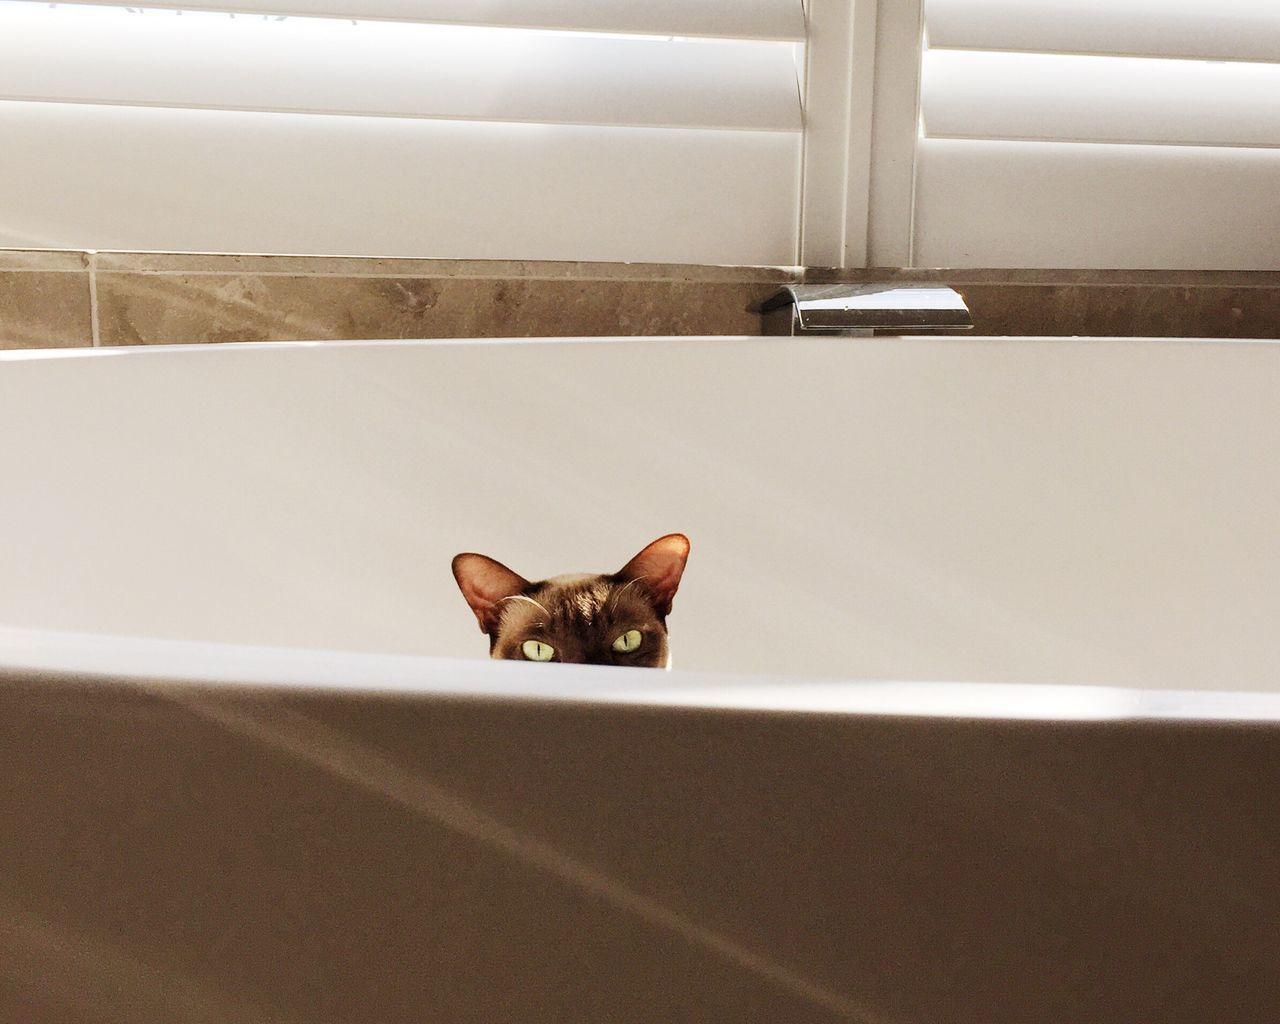 Portrait of cat in bathtub